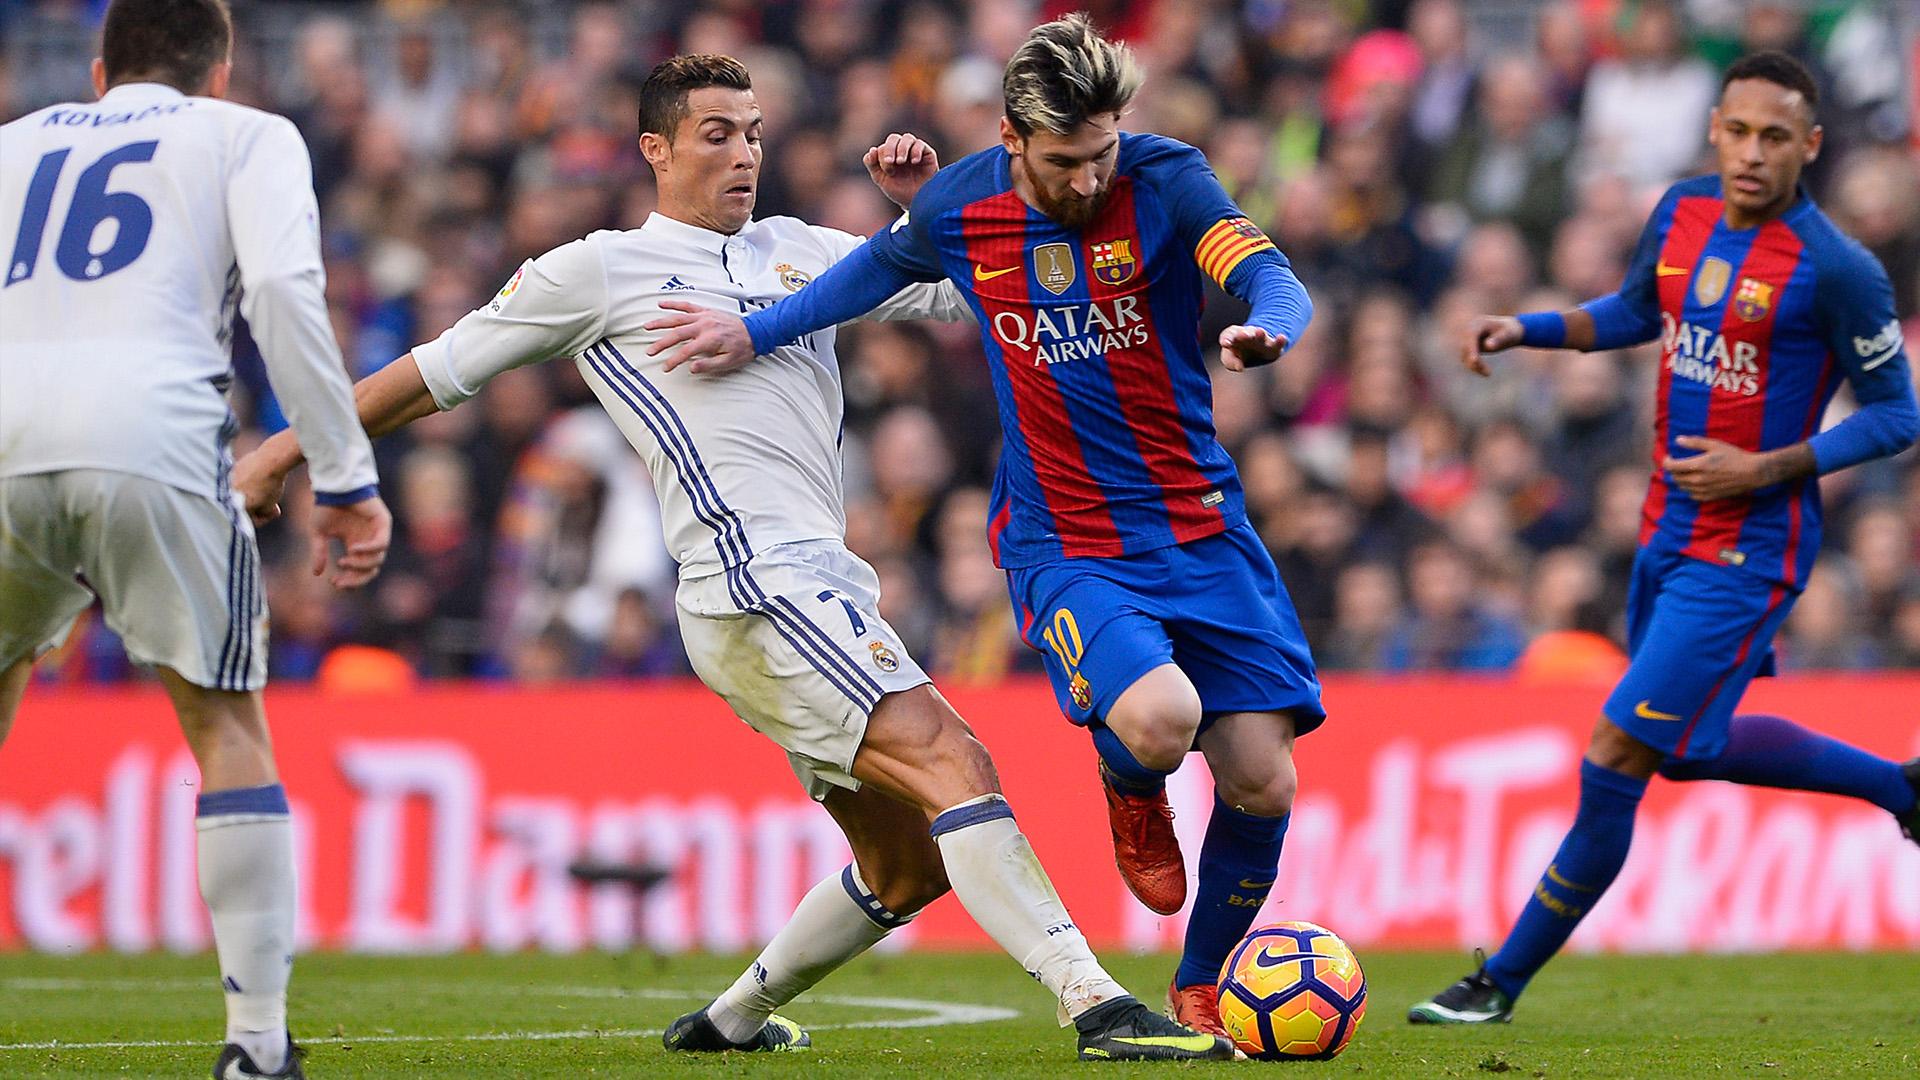 Ligue des champions, Cristiano Ronaldo invite Messi à dîner